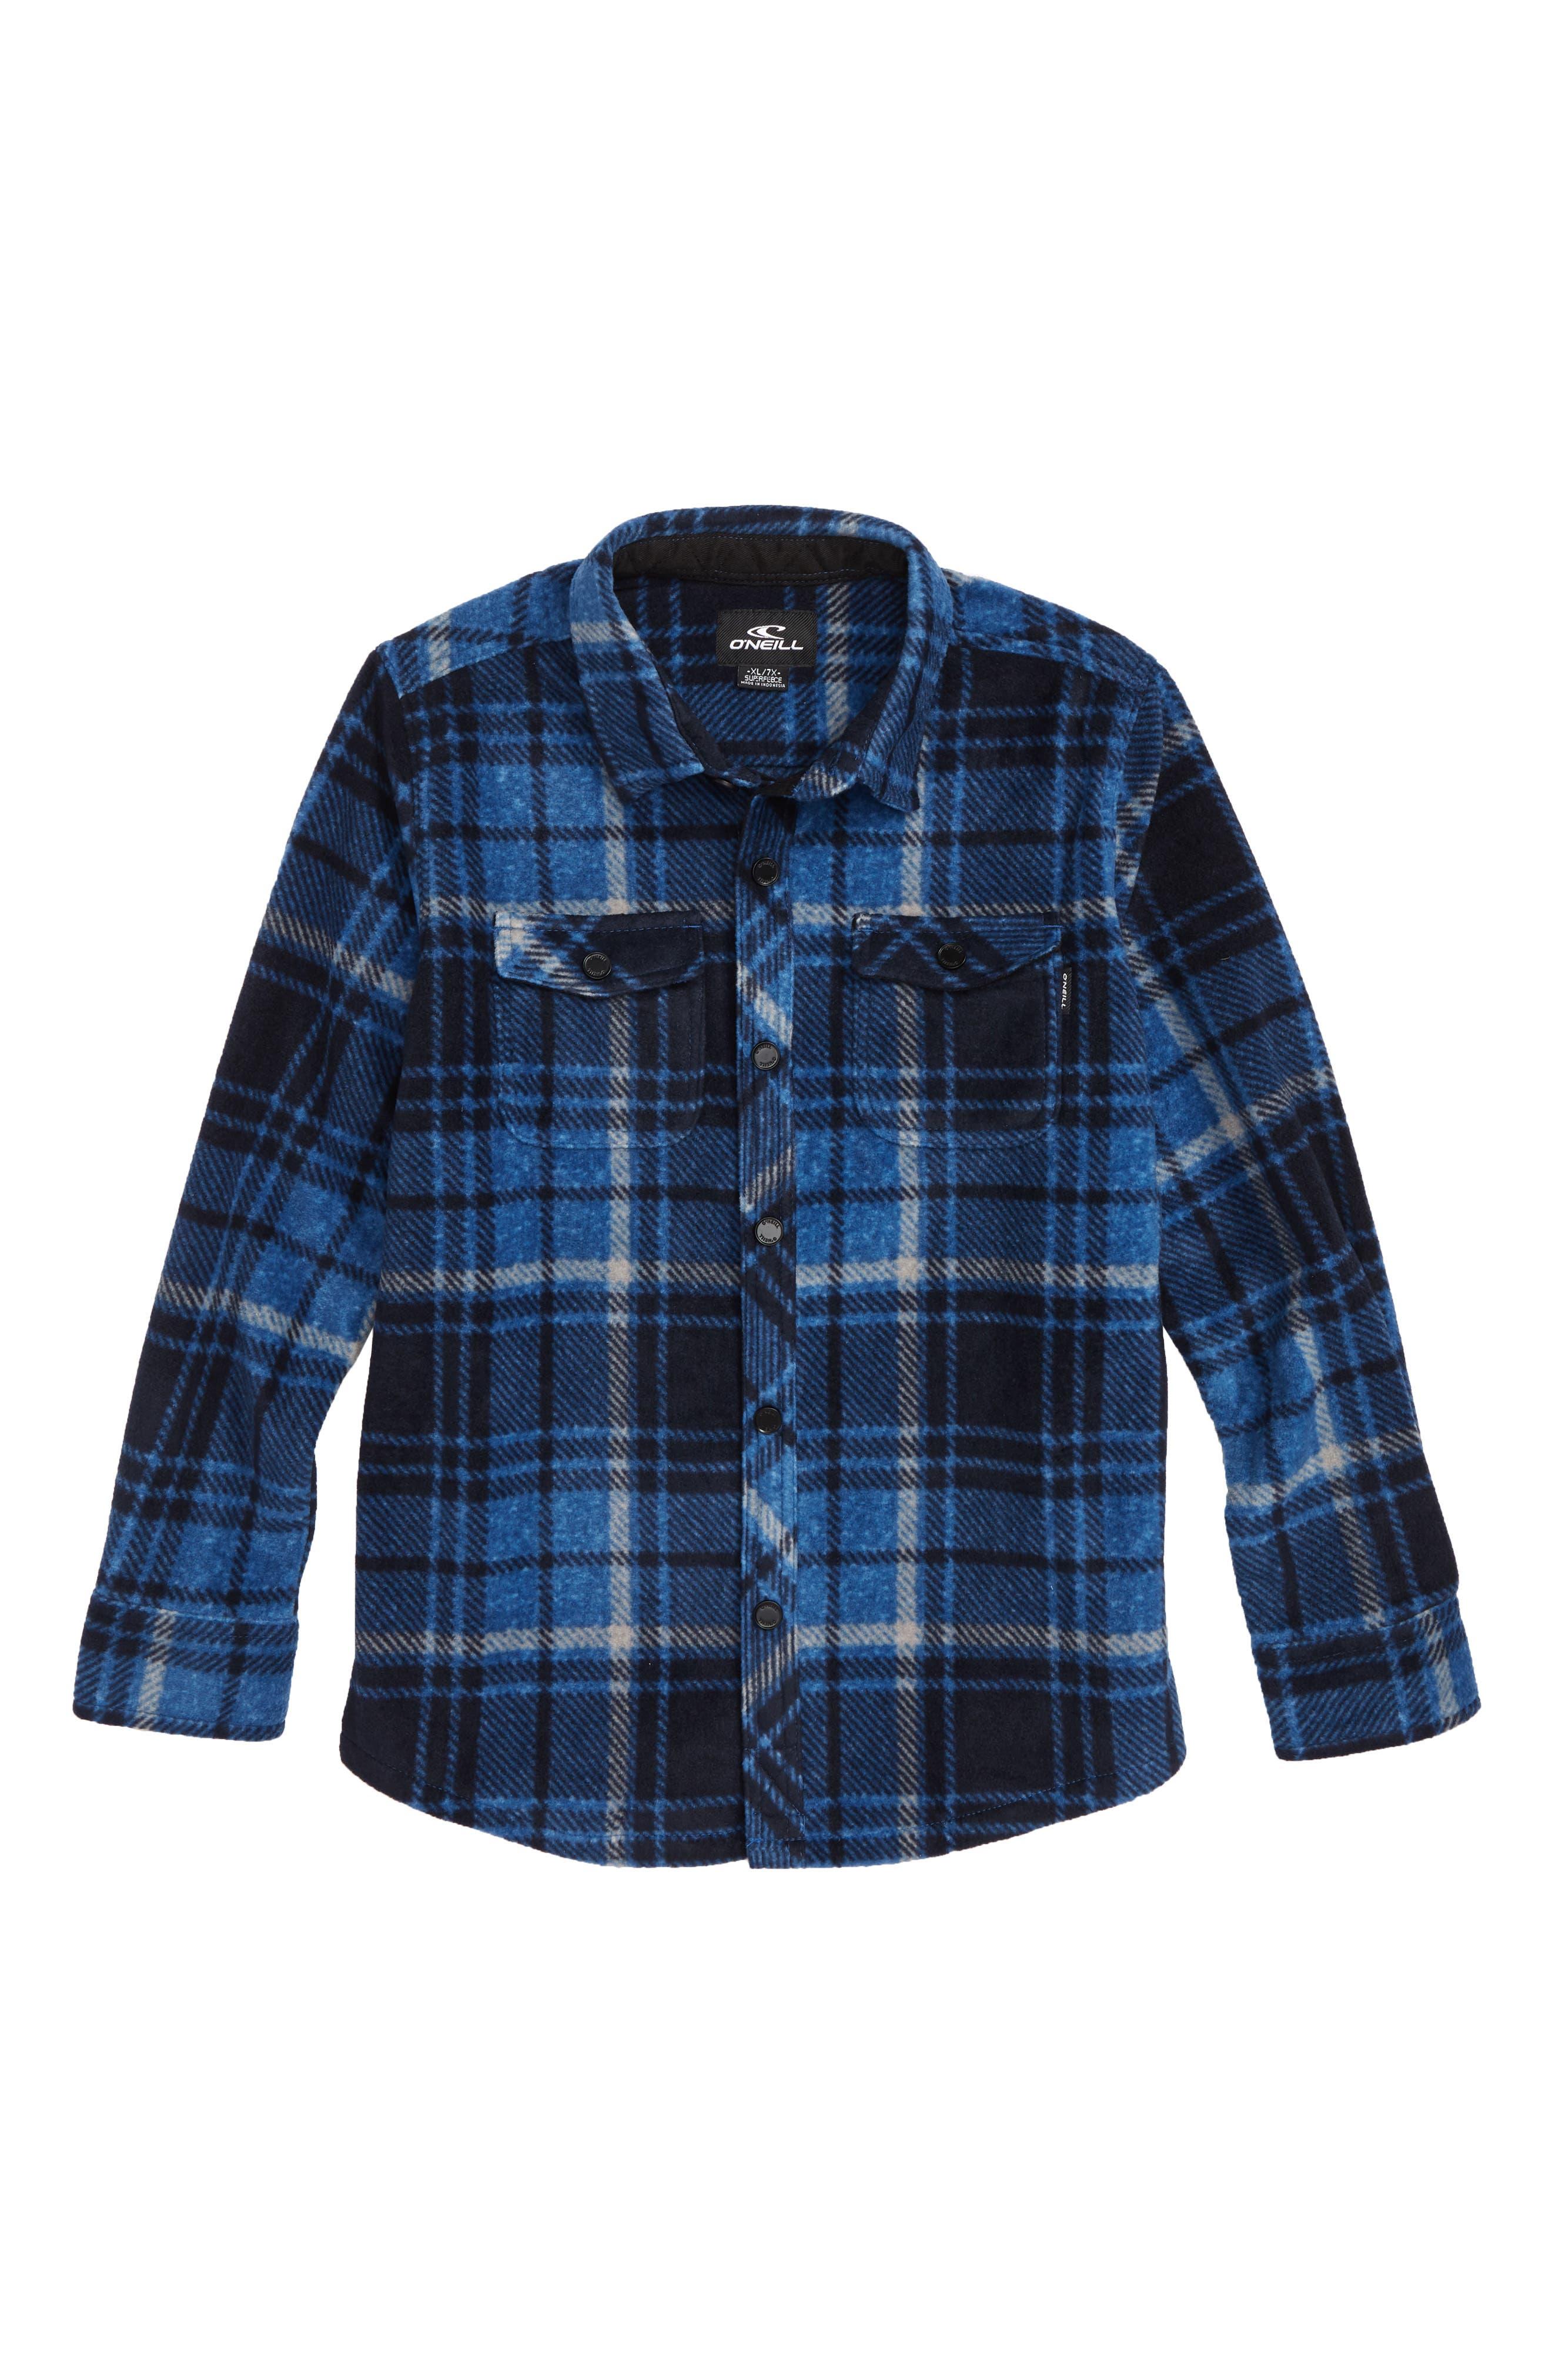 Glacier Plaid Super Fleece Shirt,                             Main thumbnail 1, color,                             DARK BLUE